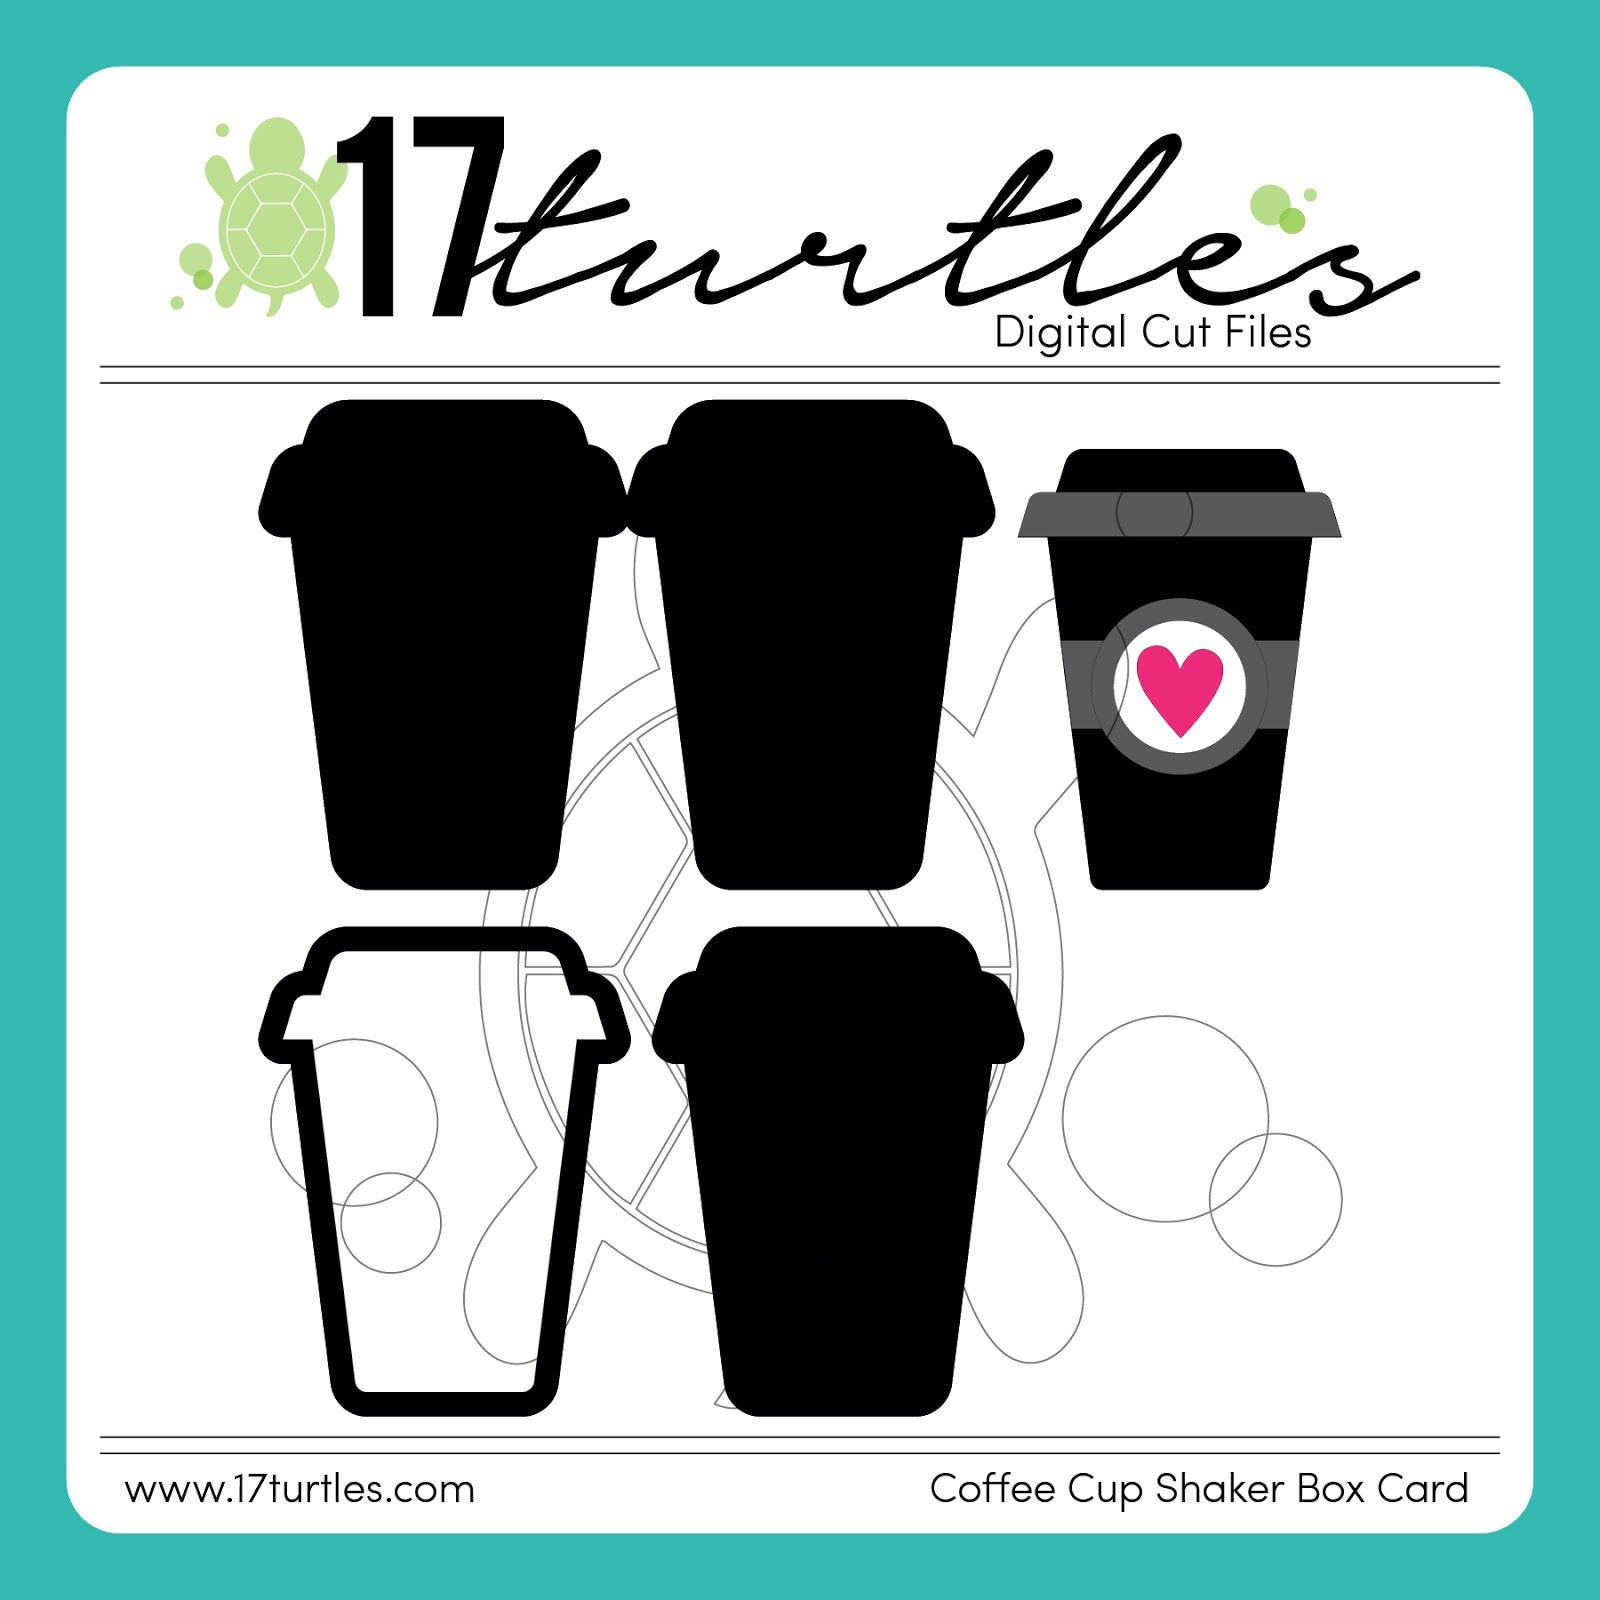 Coffee Cup Shaker Box Card Free Digital Cut File by